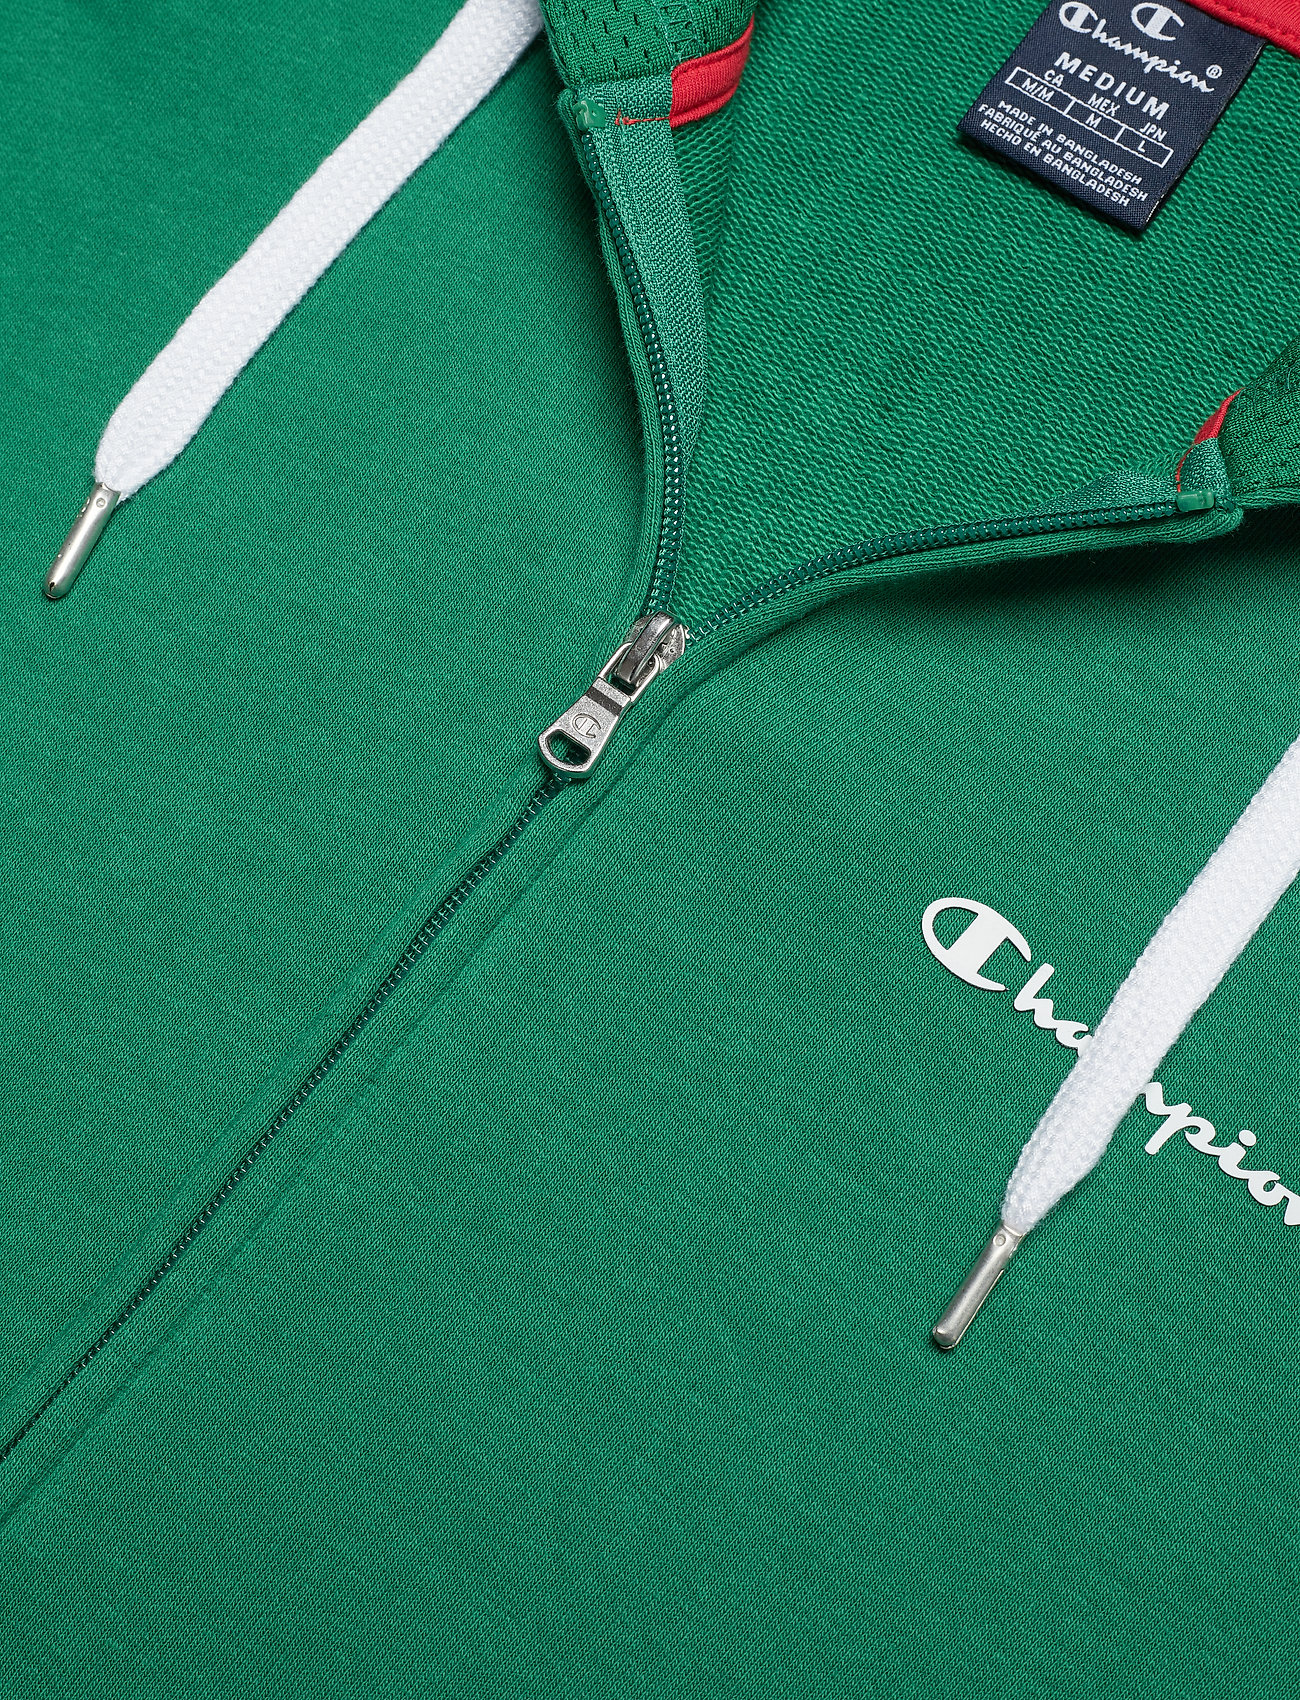 Full GreenChampion Full Hooded GreenChampion Zip Sweatshirtverdant Full Hooded Sweatshirtverdant Zip Hooded Zip 7Ybf6yIvg